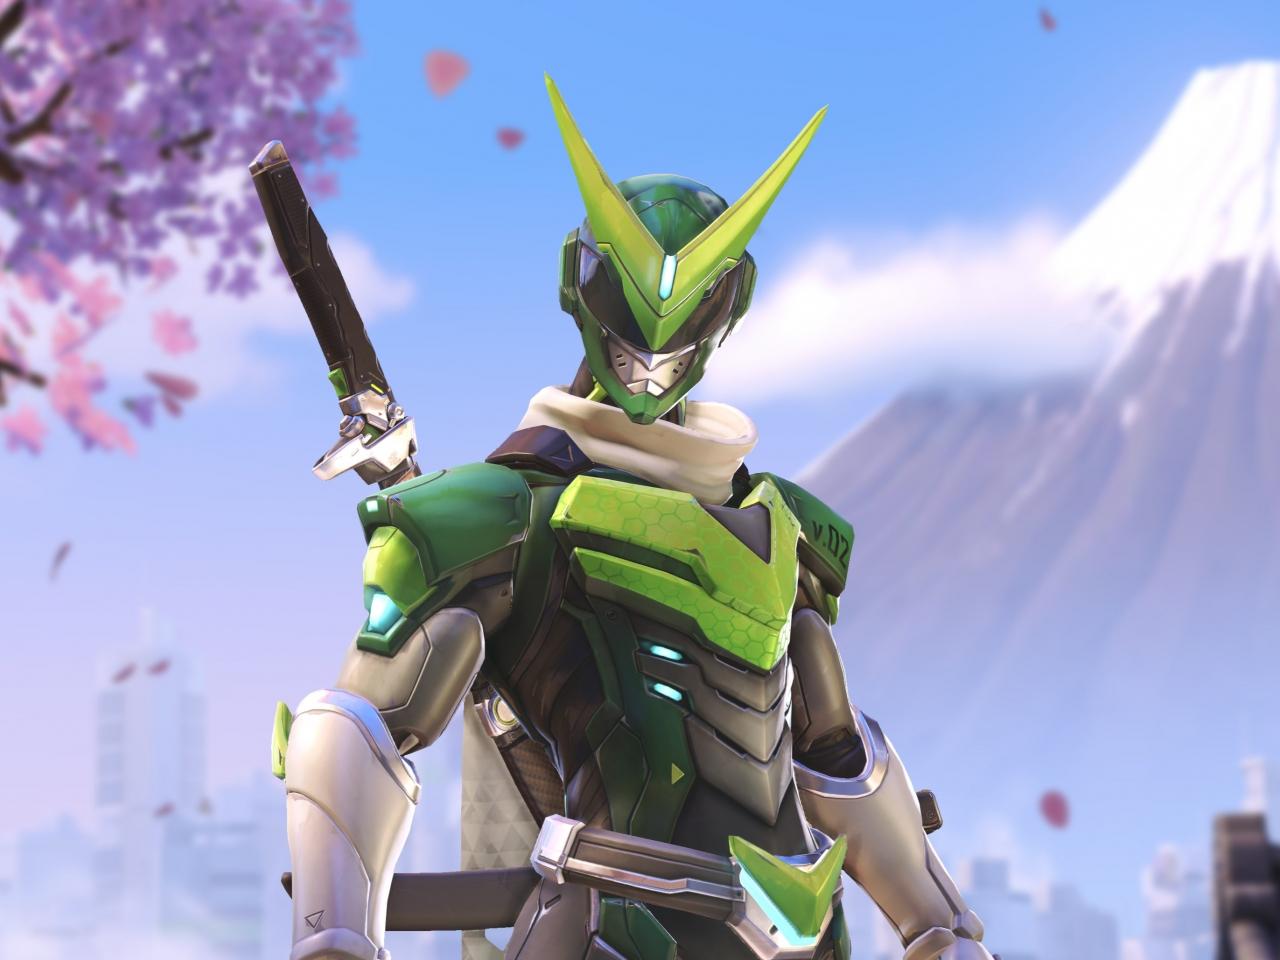 Download 1280x960 Wallpaper Overwatch Genji Green Skin